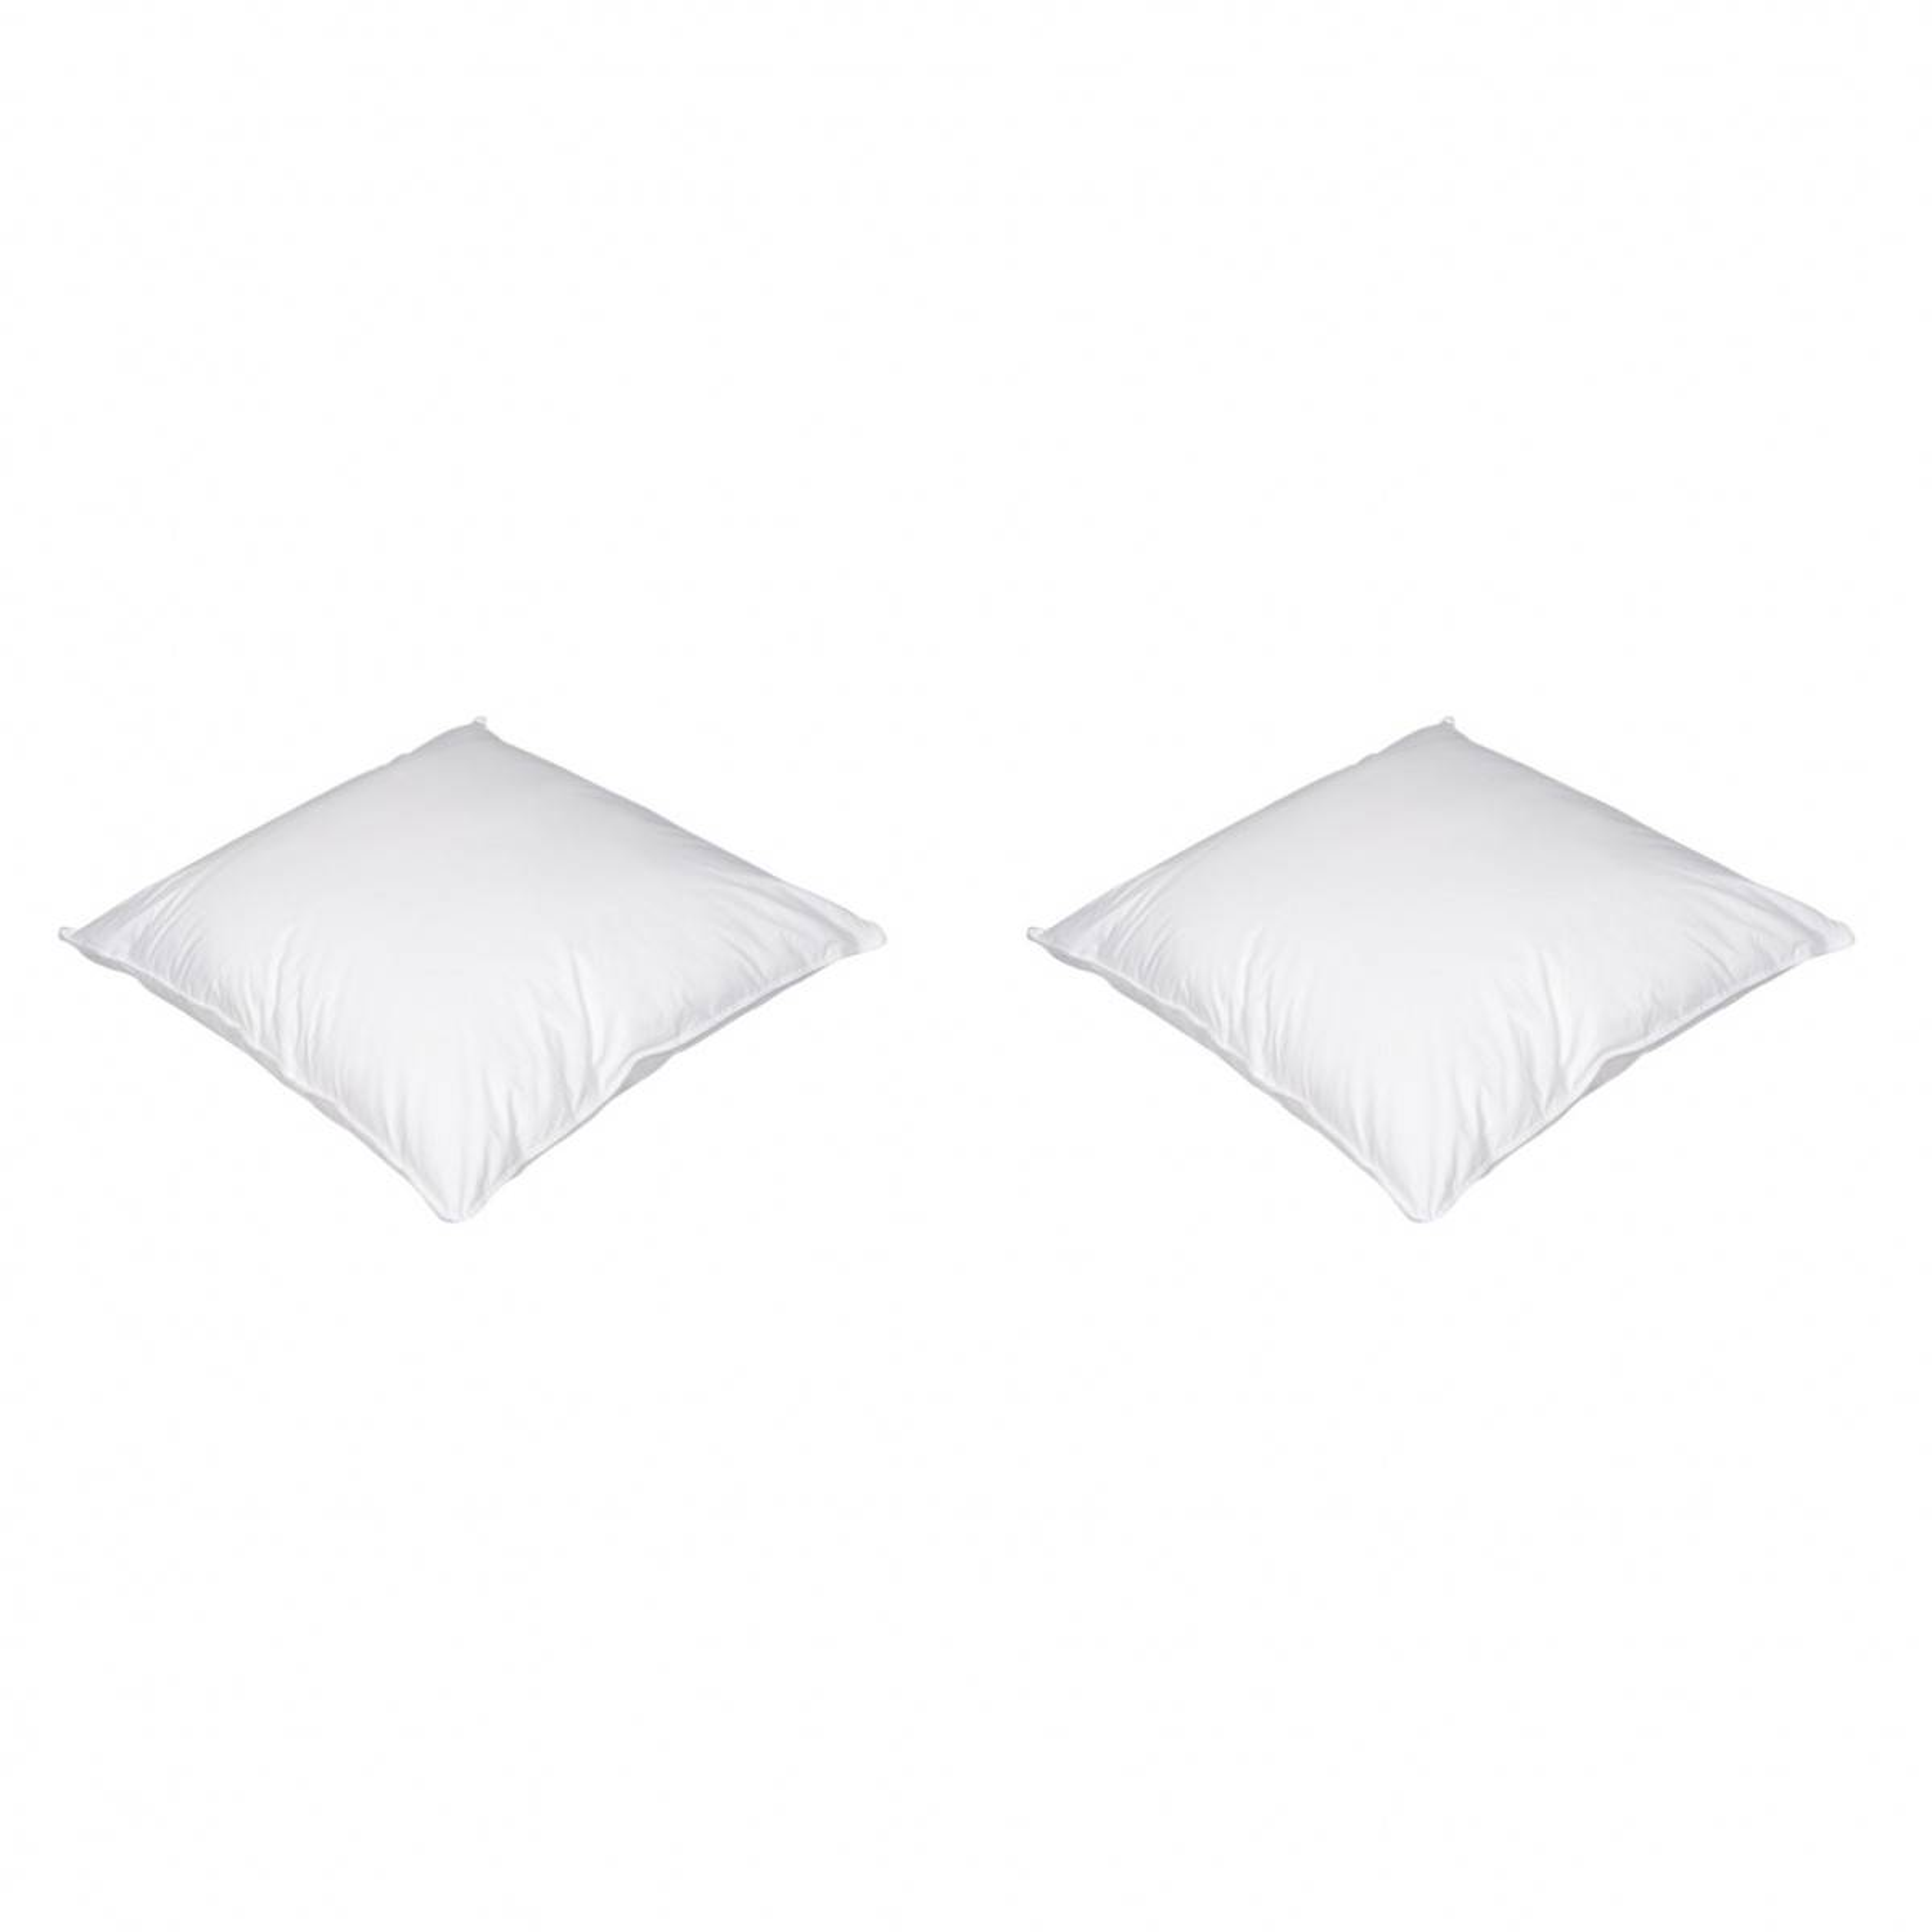 Someo Lot de 2 oreillers luxe enveloppe percale anti-acariens SOMEO 50x70